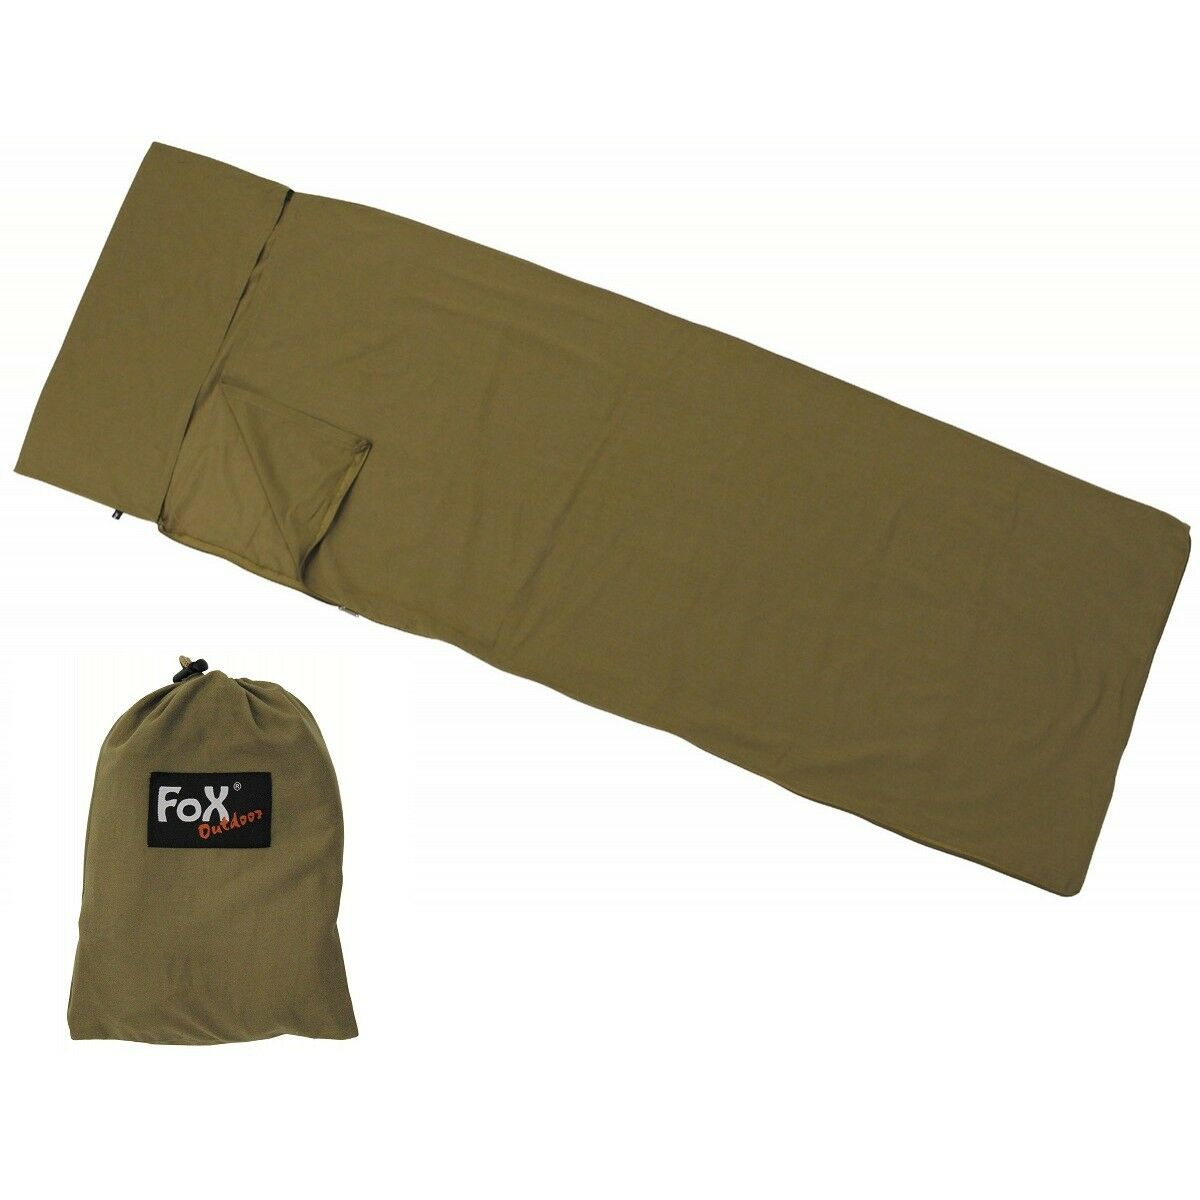 Sac Inlett de couchage Inlett Sac 100% coton Cabines Sac de couchage été camping c8b23e